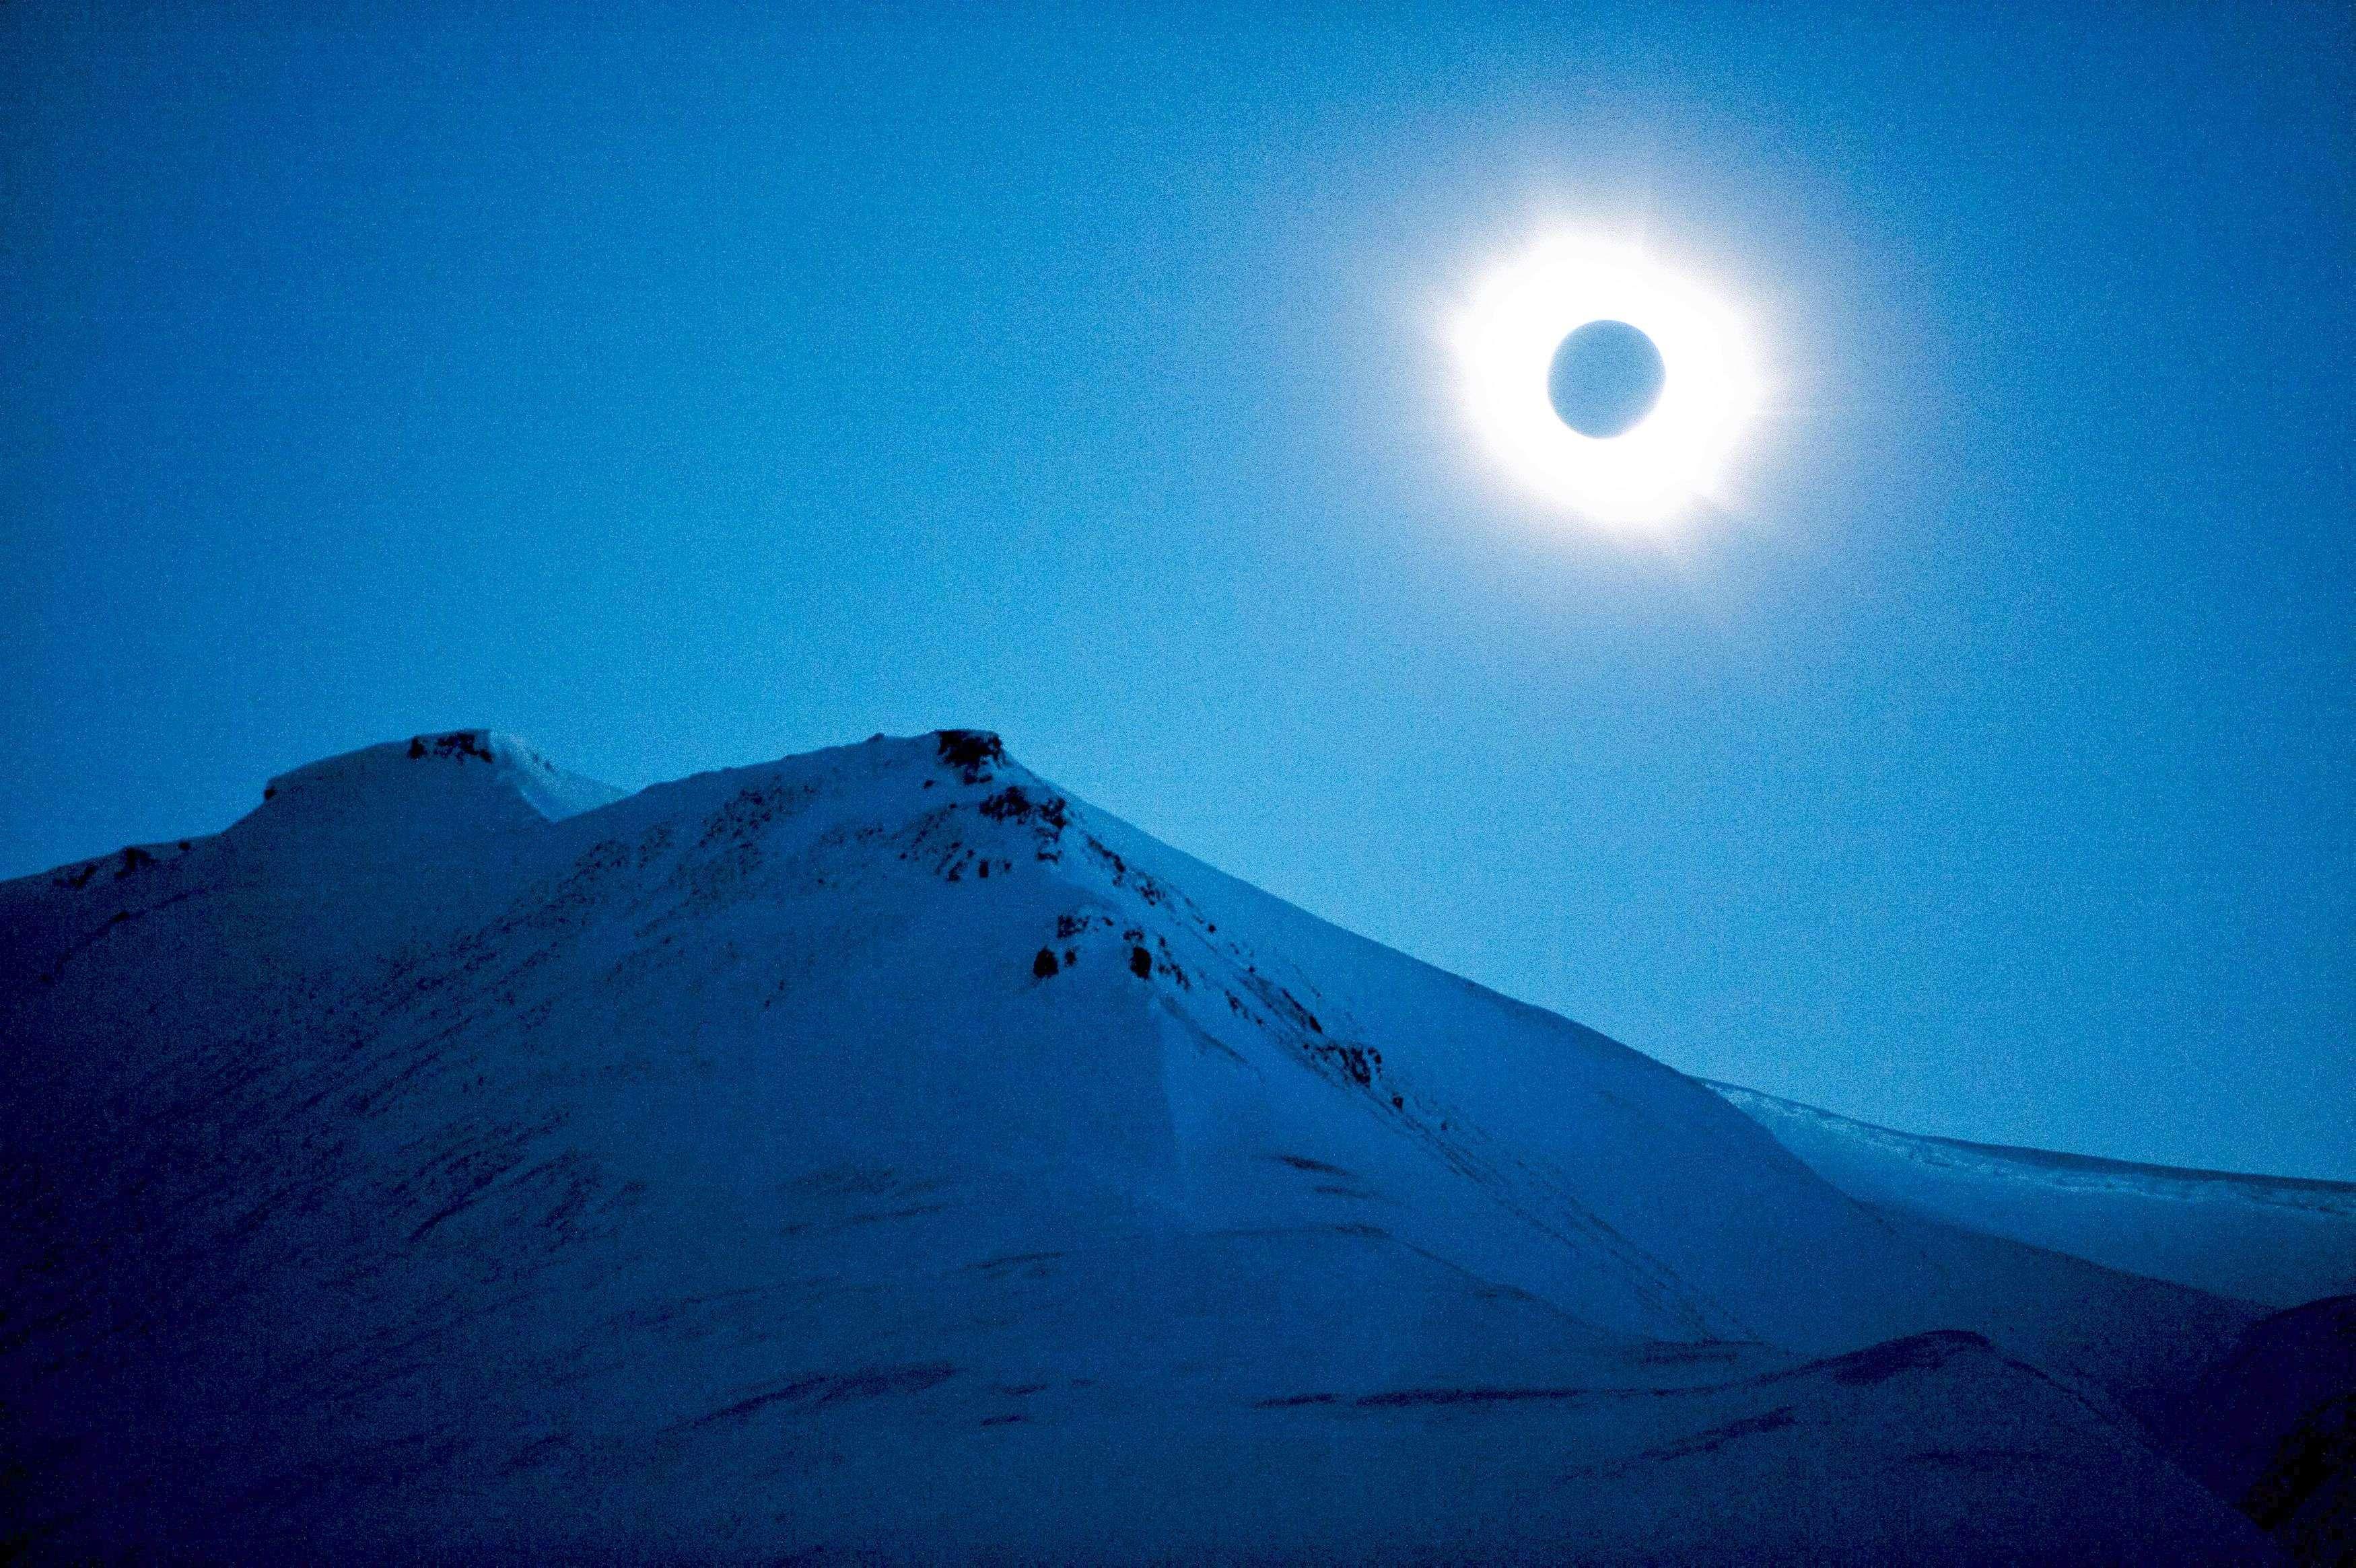 A total solar eclipse is seen in Longyearbyen on Svalbard. (REUTERS/Jon Olav Nesvold)